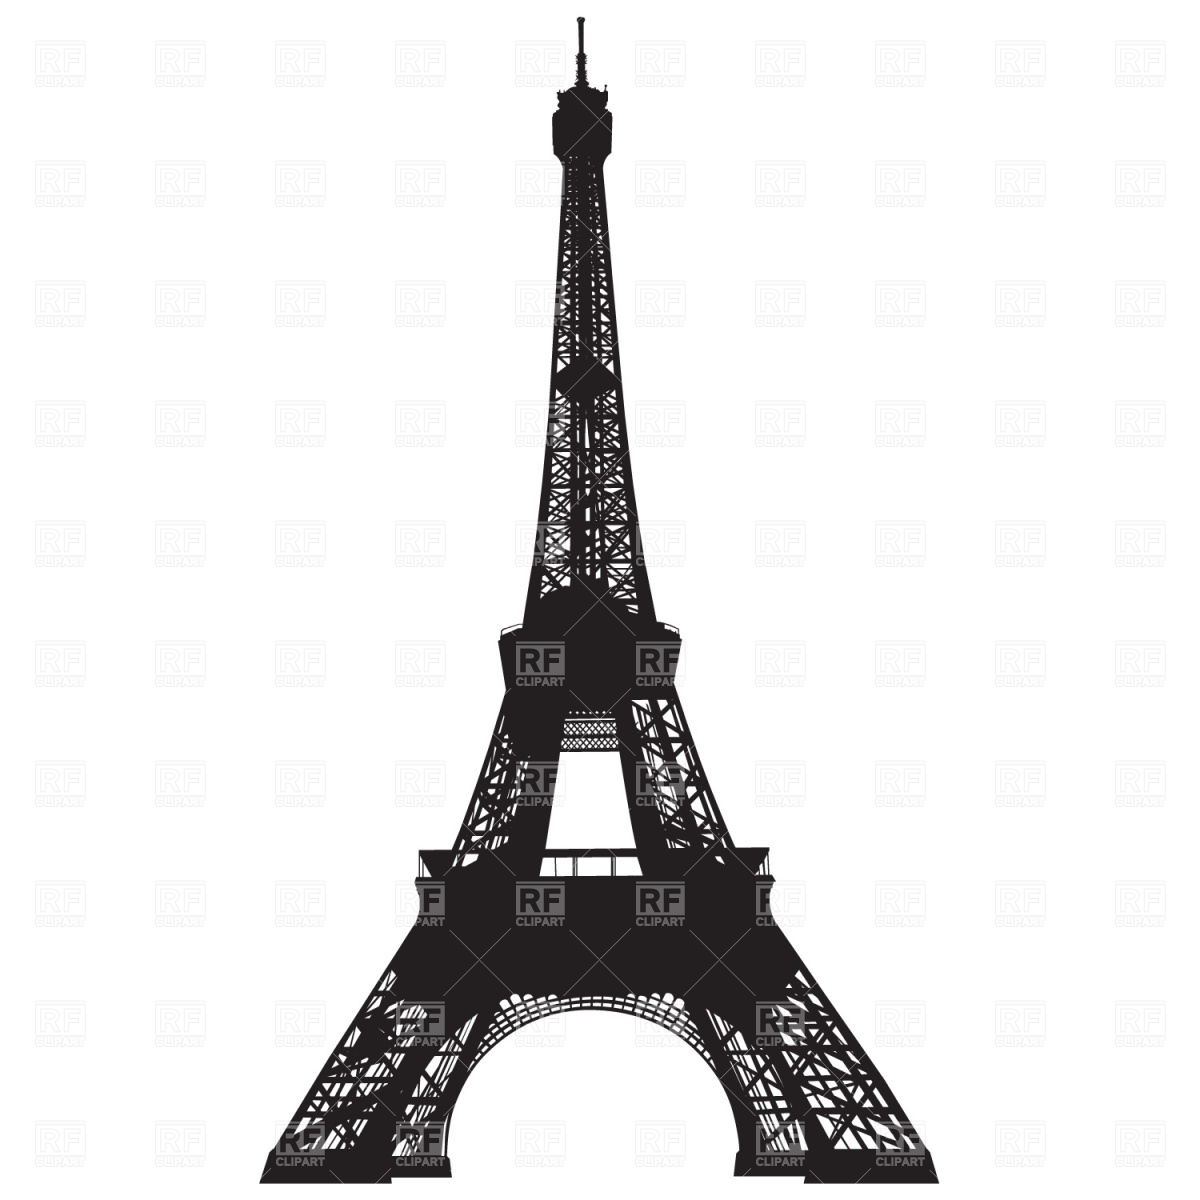 In Paris 946 Travel Download Royalty Fre-In Paris 946 Travel Download Royalty Free Vector Clipart Eps-5